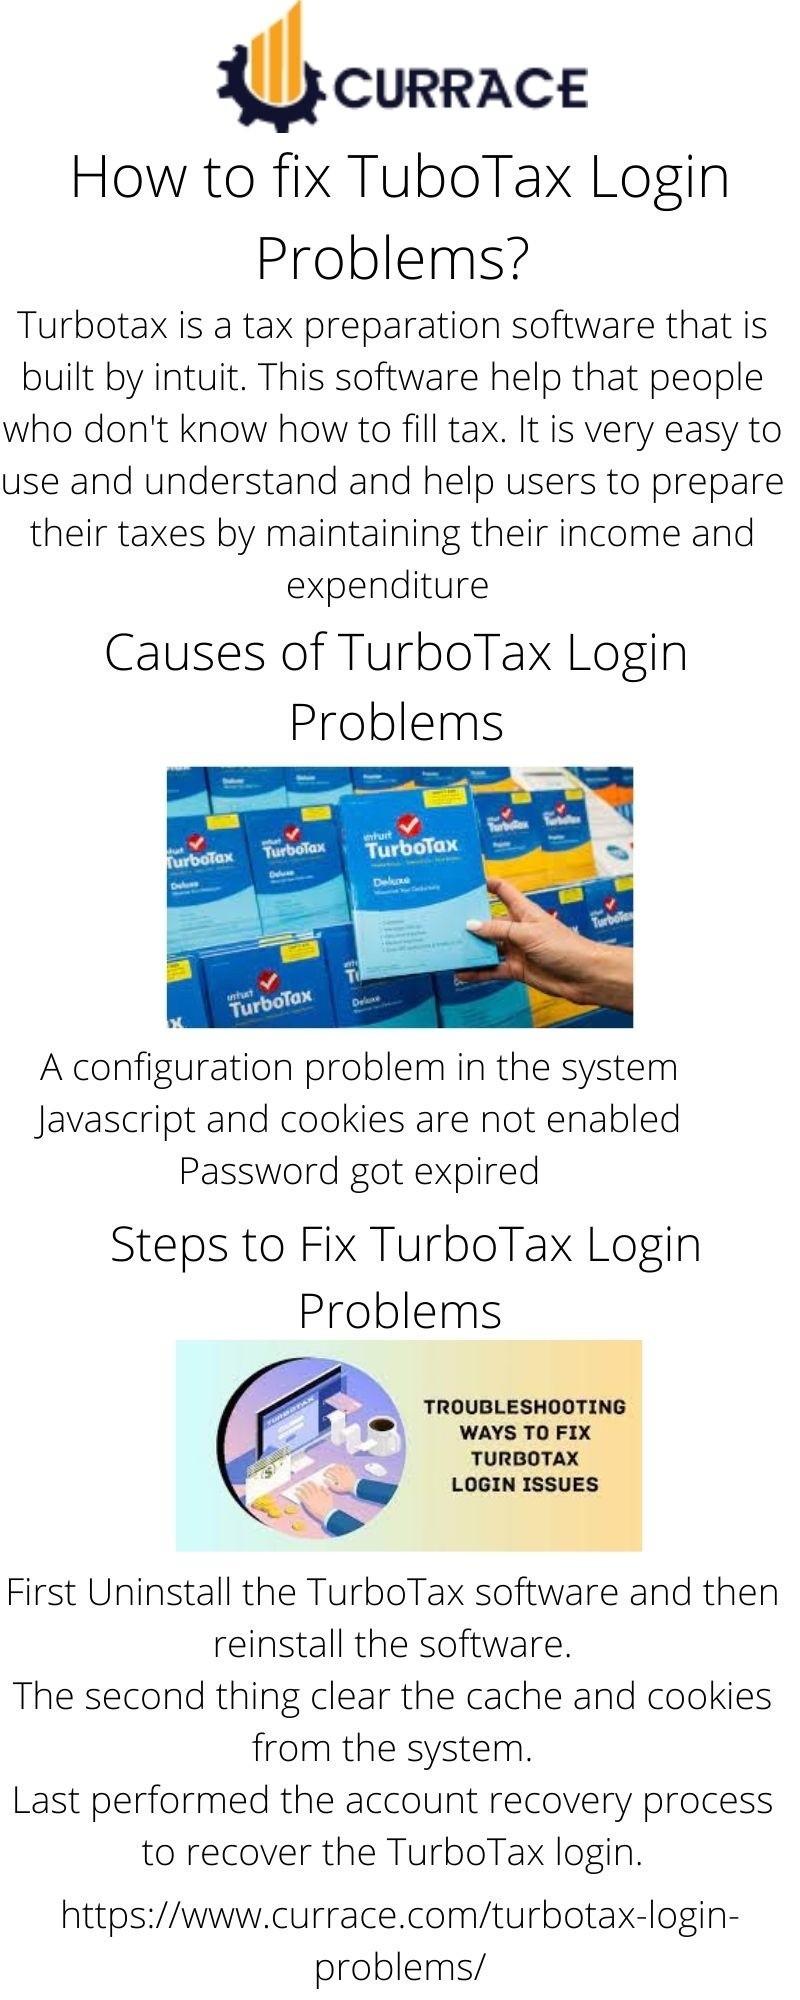 How to fix TurboTax Login Problems?